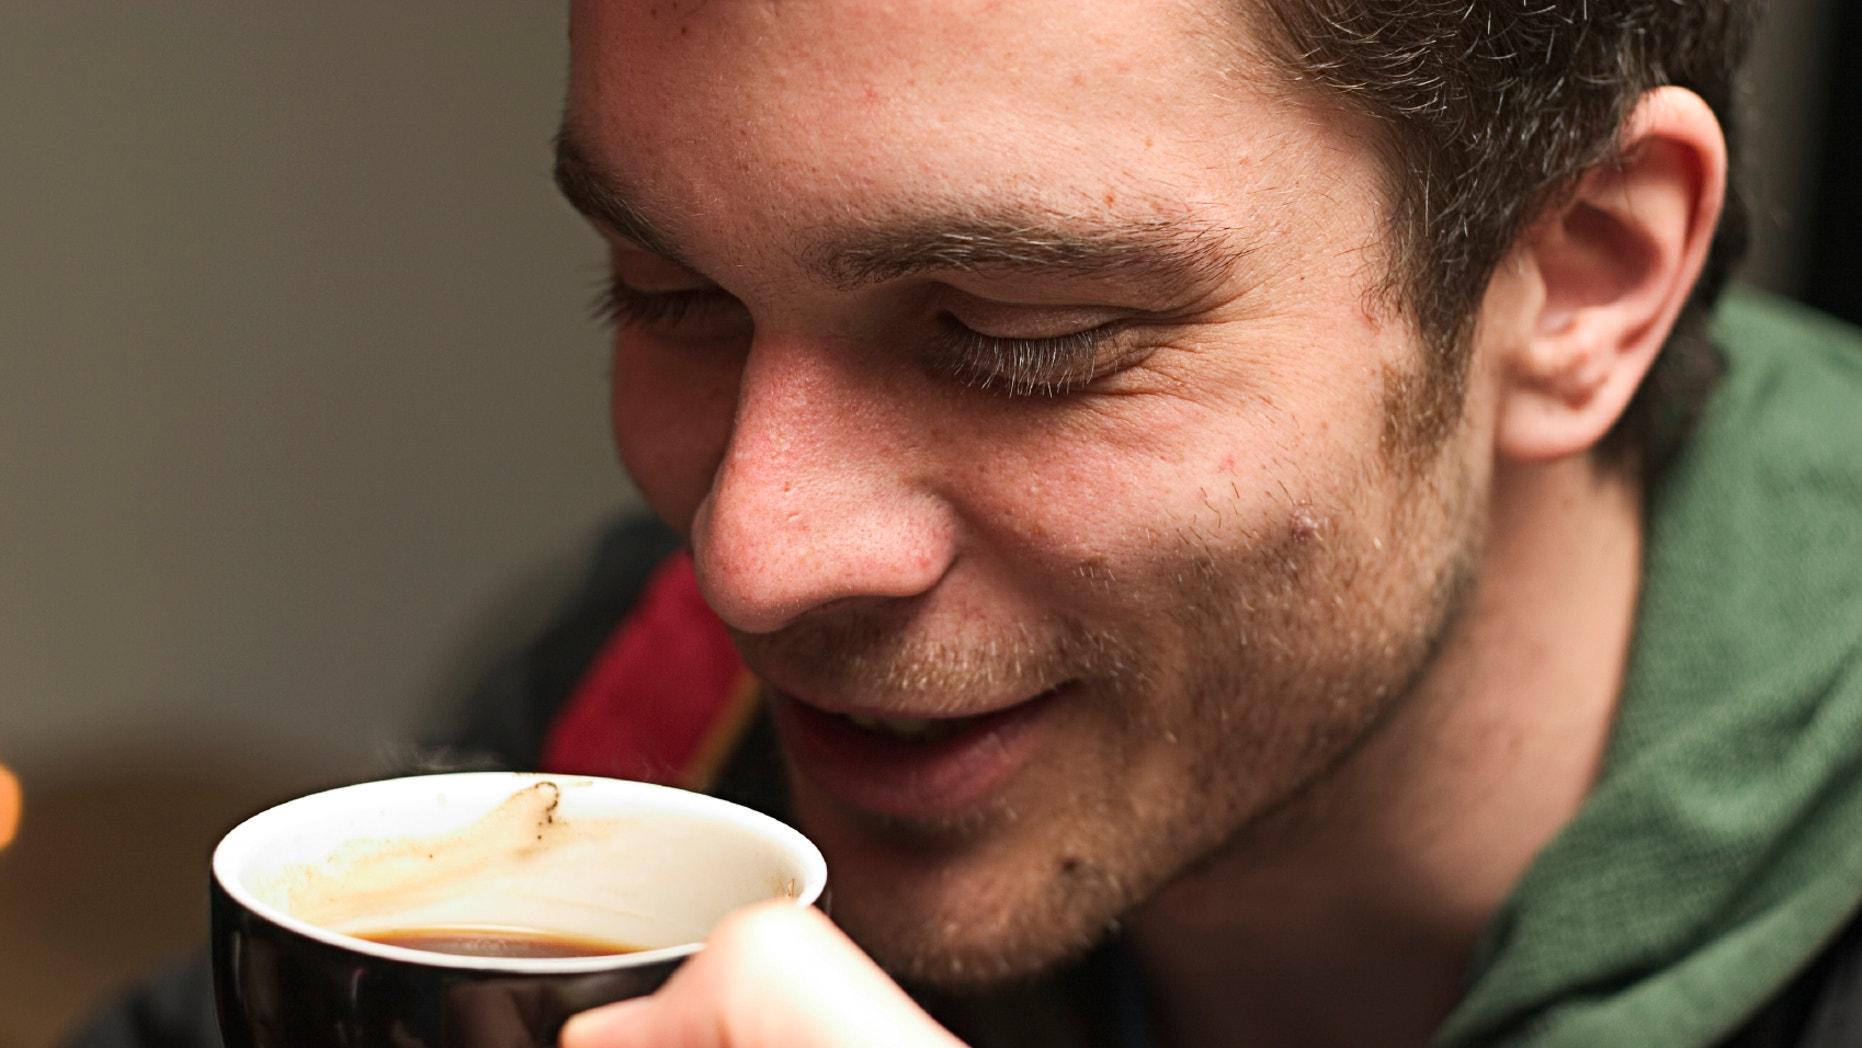 Young man enjoying a nice warm cup of coffee.